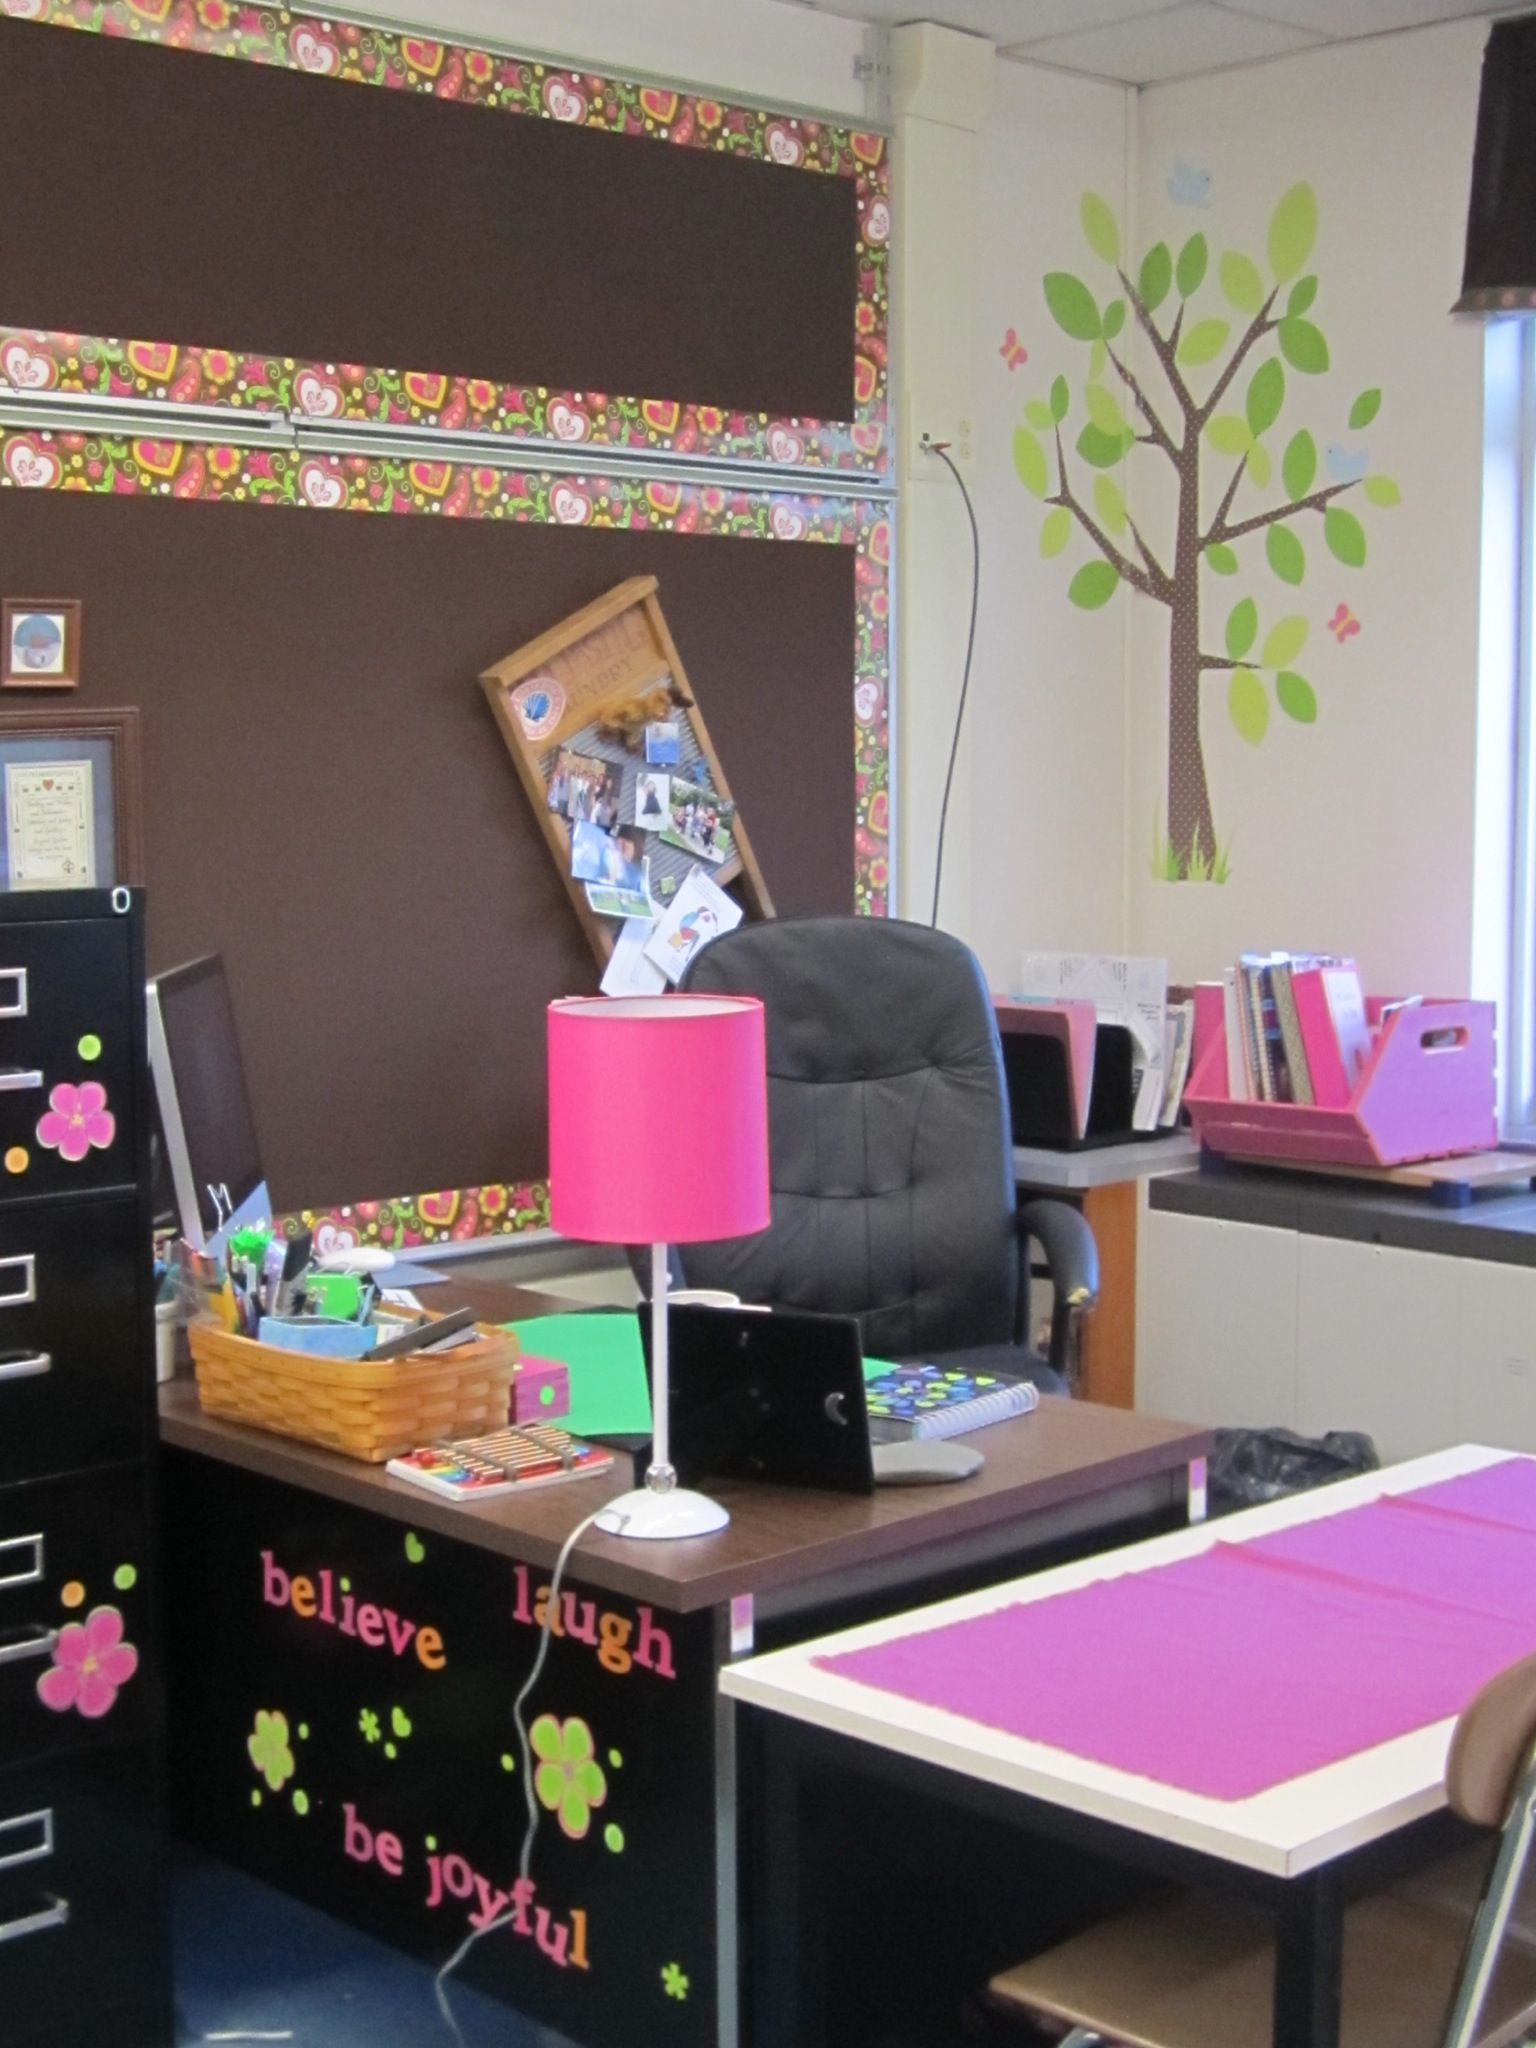 decor lighting items class top ideas decorating decoration small flair desk classroom first teacher